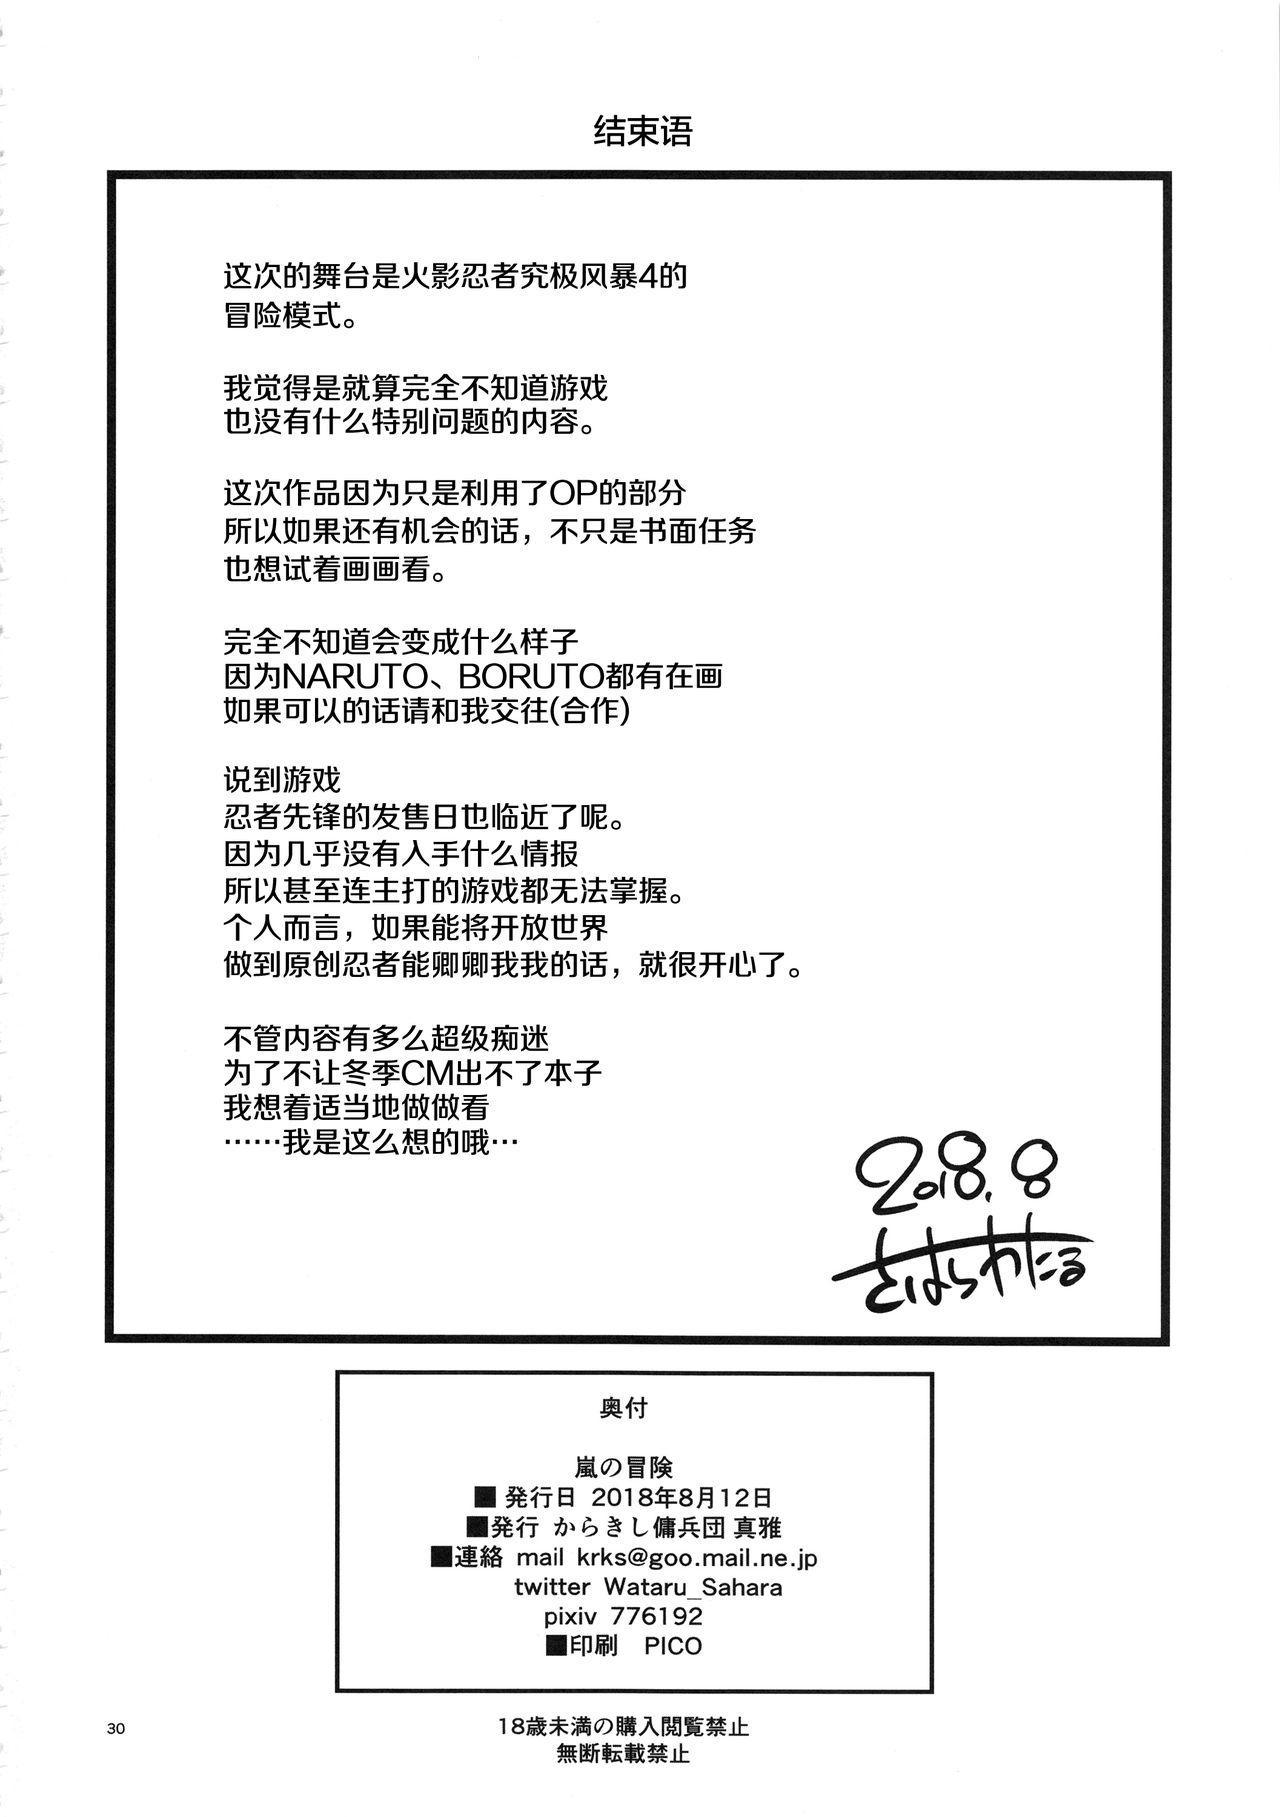 Arashi no Bouken 28